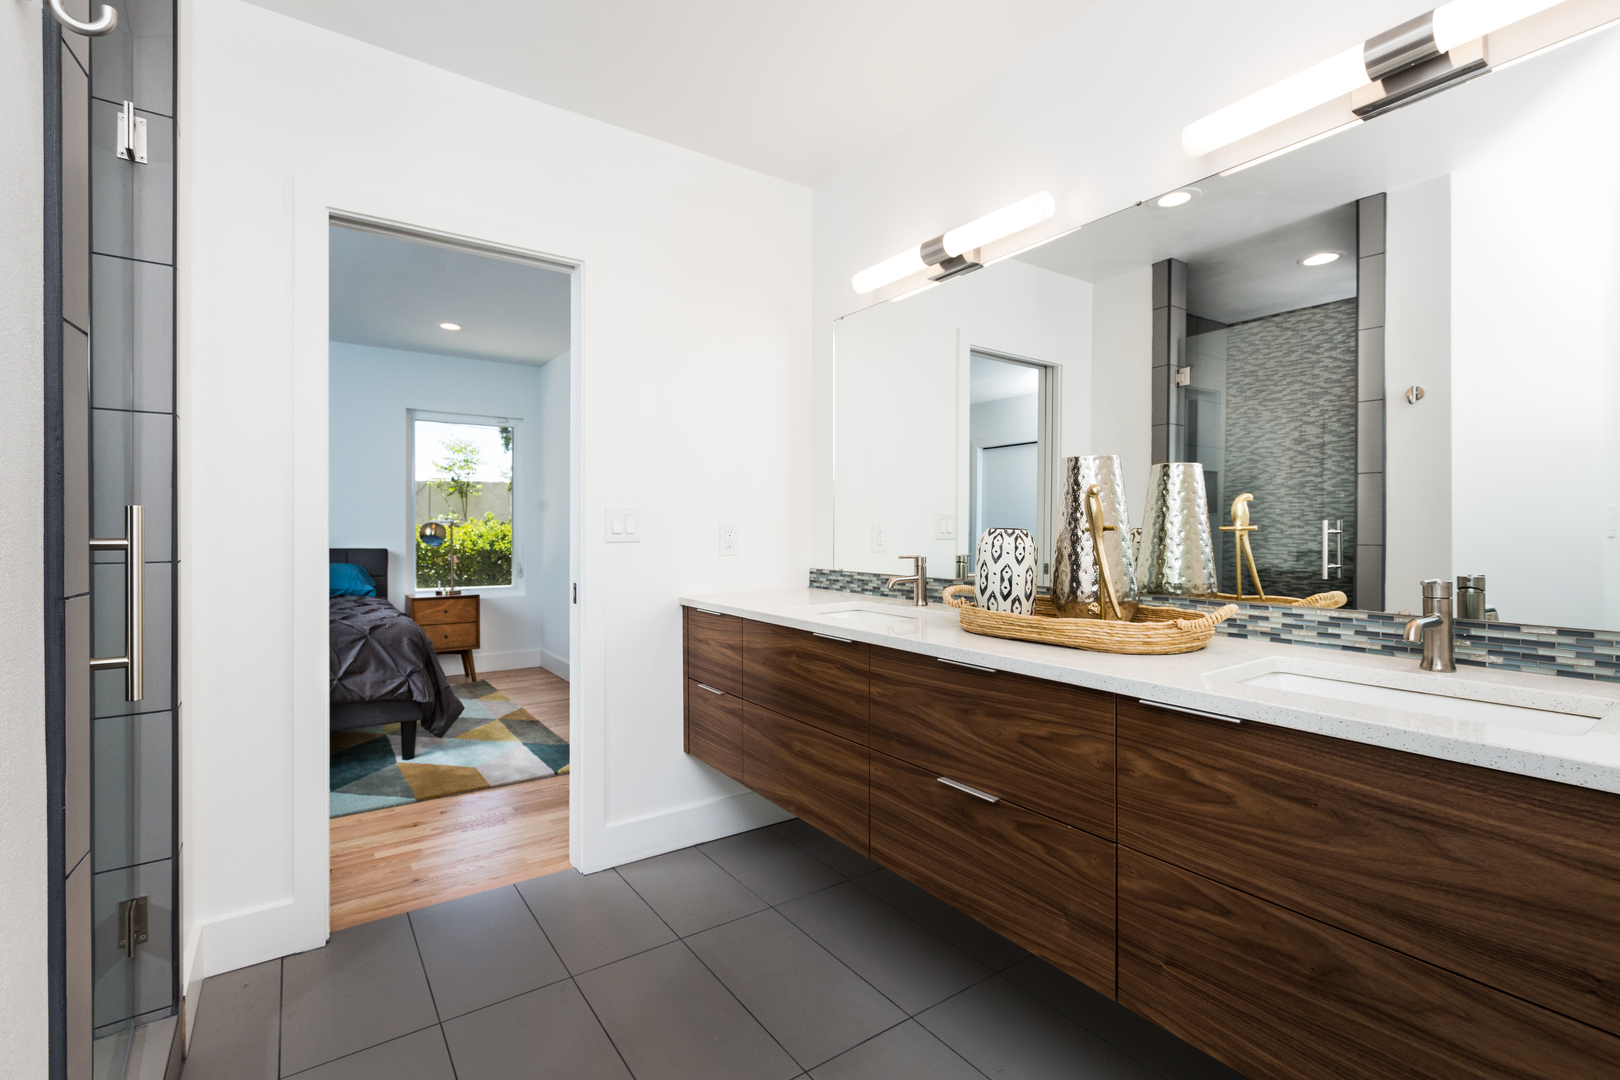 Bathroom Design Albuquerque kitchen and bath design - more brothers construction - albuquerque, nm